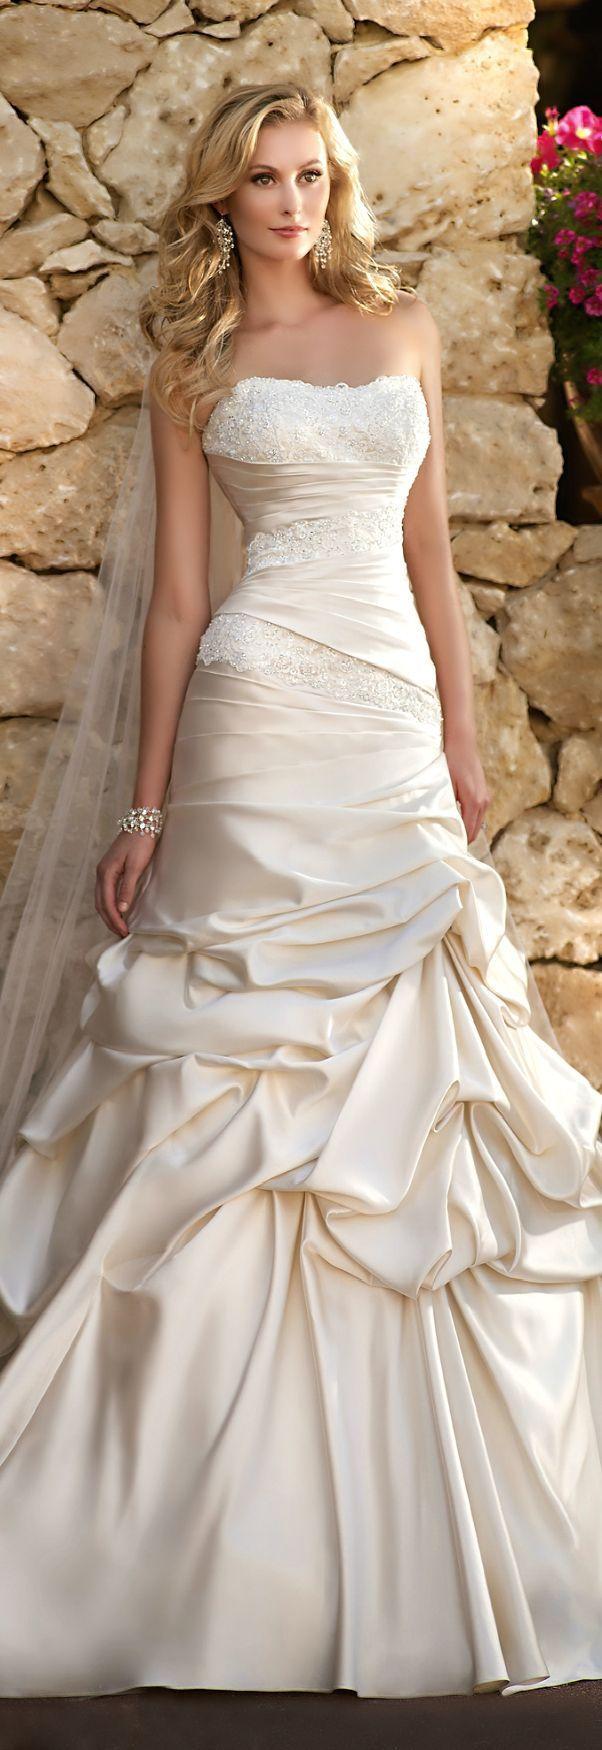 Exquisite Satin & Lace Cascading Ruffle Wedding Dress ♥